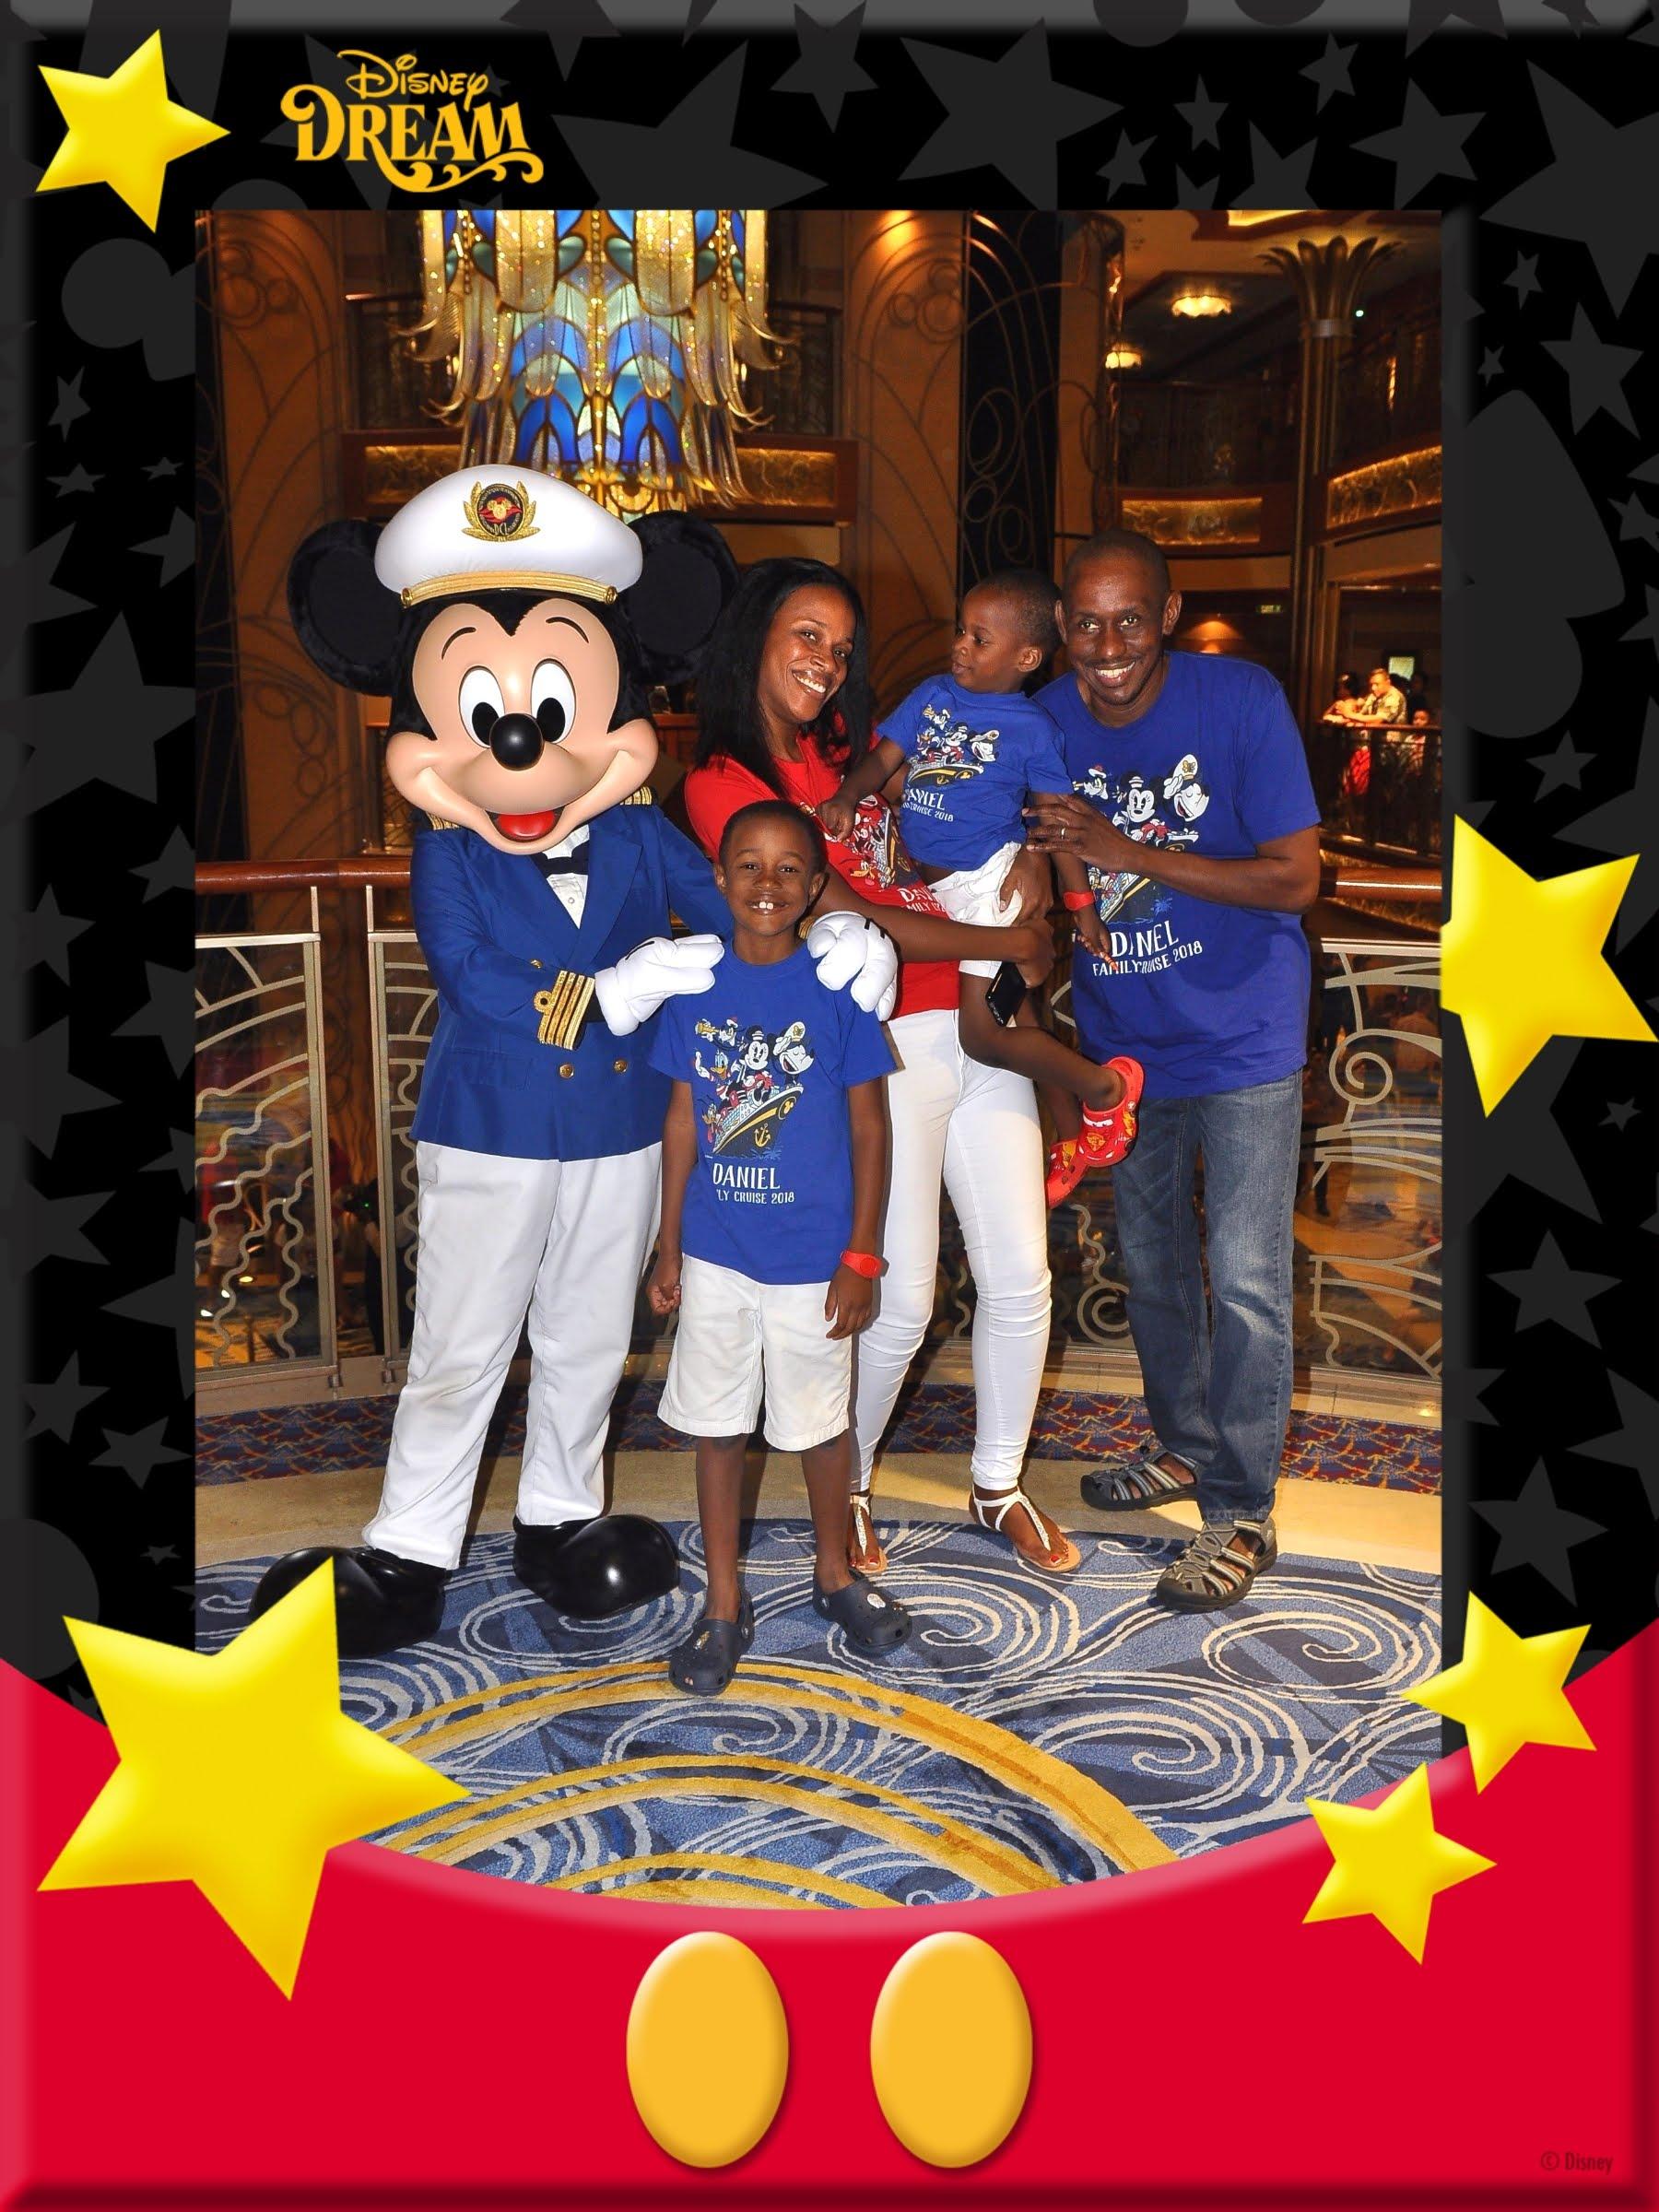 784-68656016-Classic CL Mickey Sailor 4 MS-50114_GPR.jpg